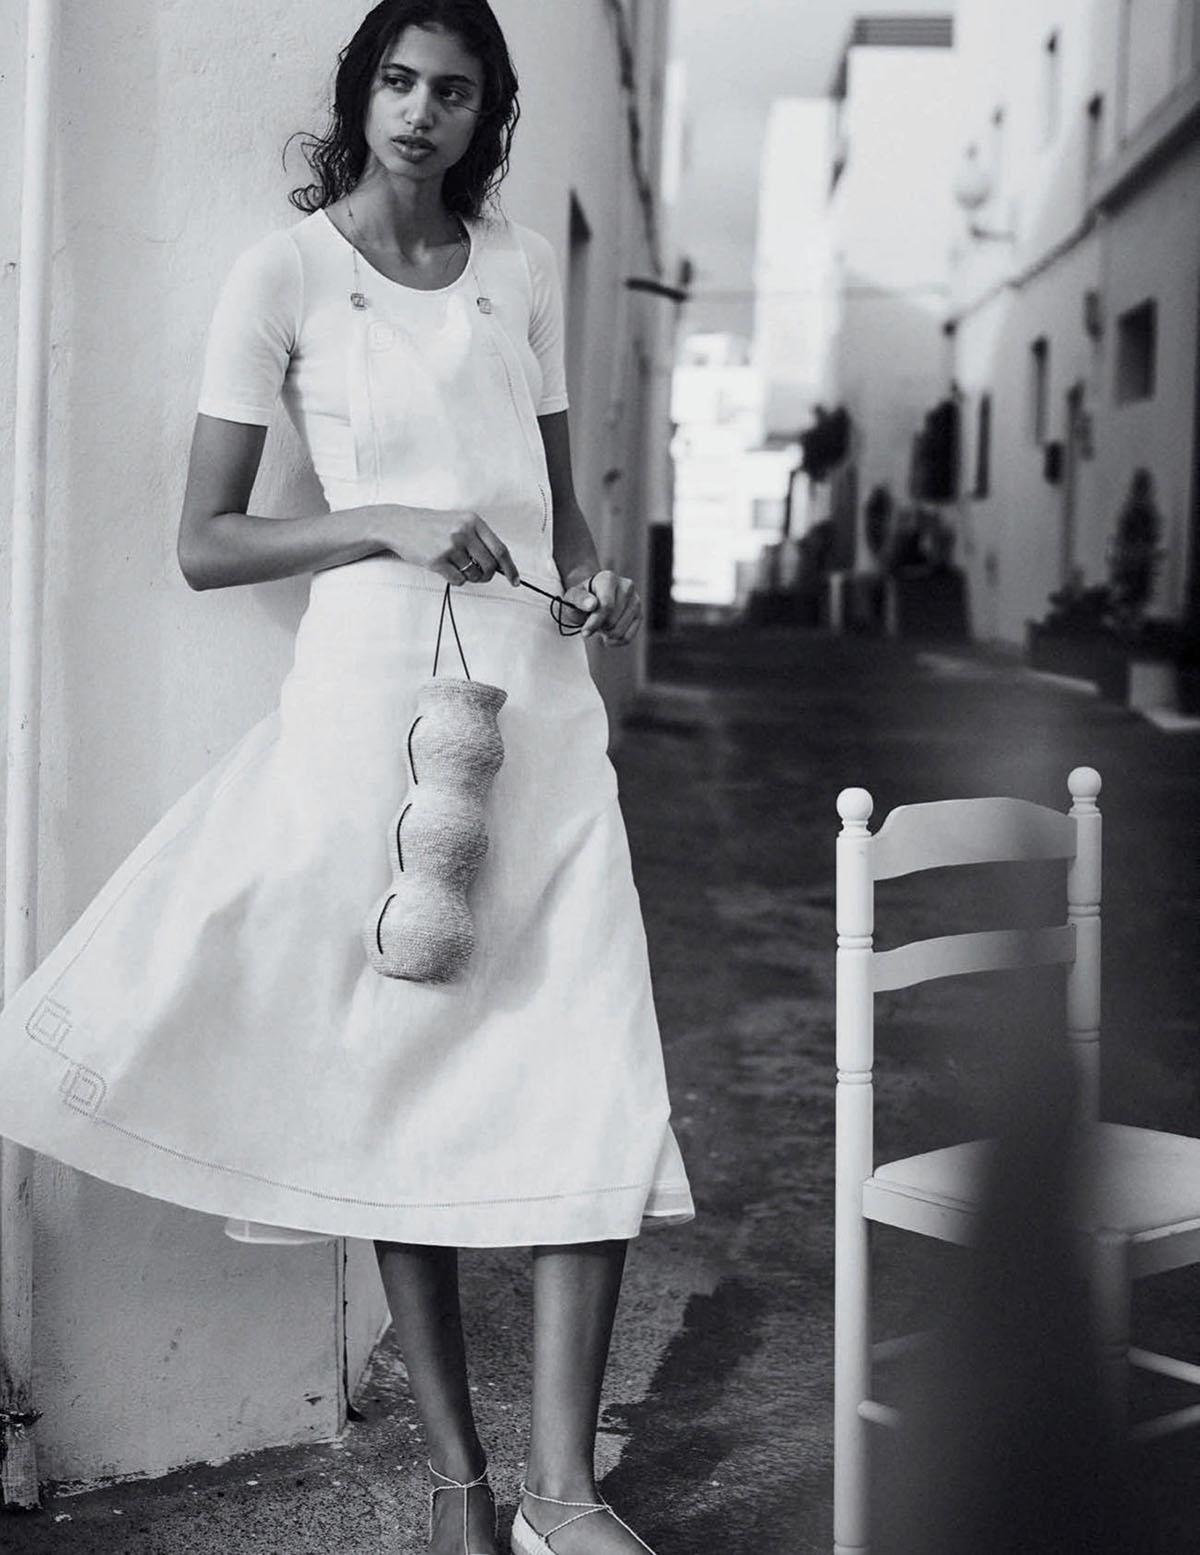 Malika El Maslouhi by Boo George for Vogue Spain June 2021